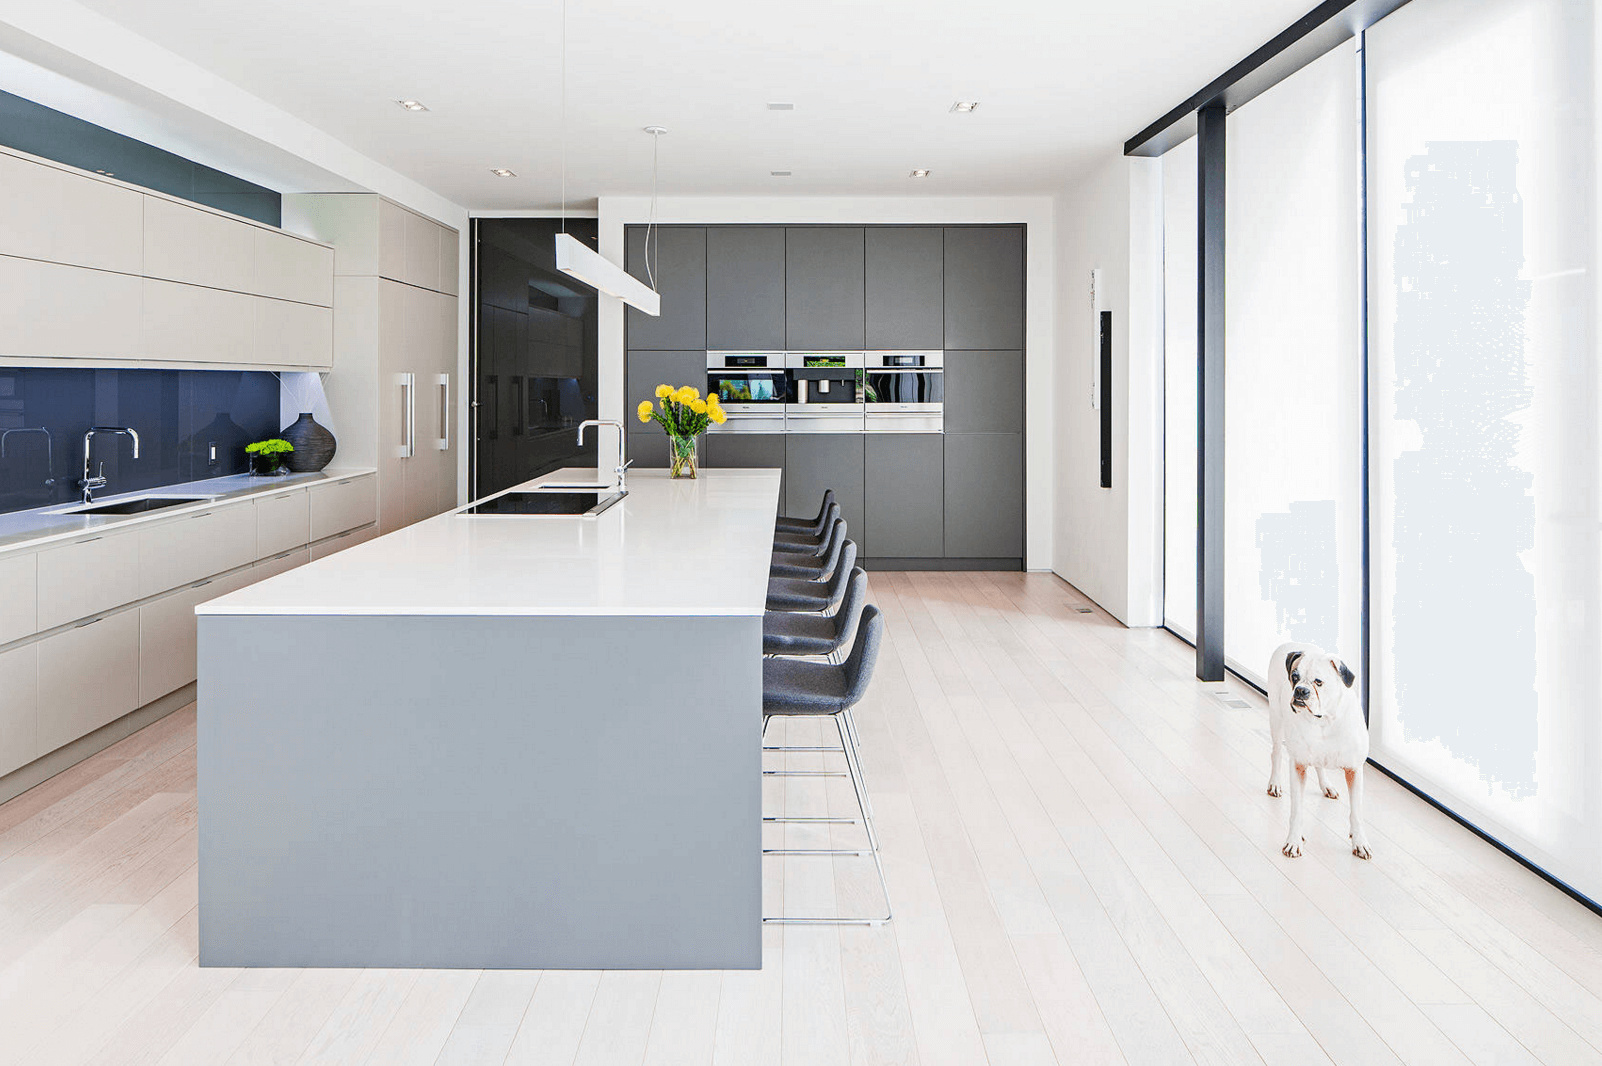 minimalisme cuisine gris blanche beige